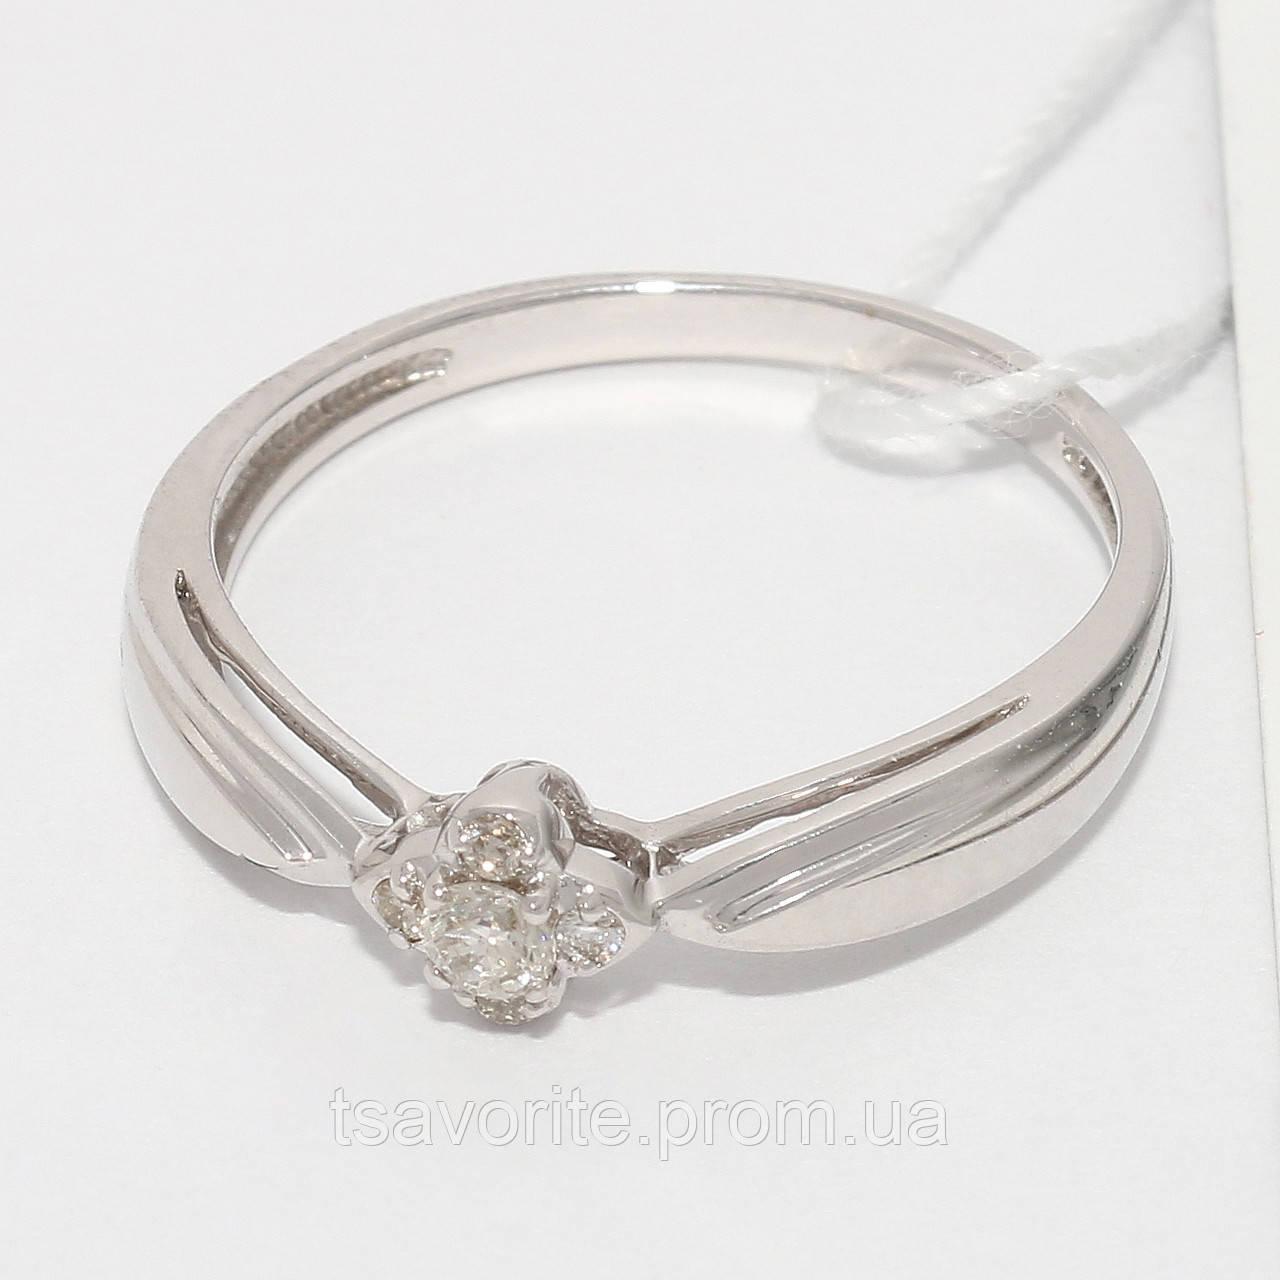 Золотое кольцо с бриллиантами НХК-37